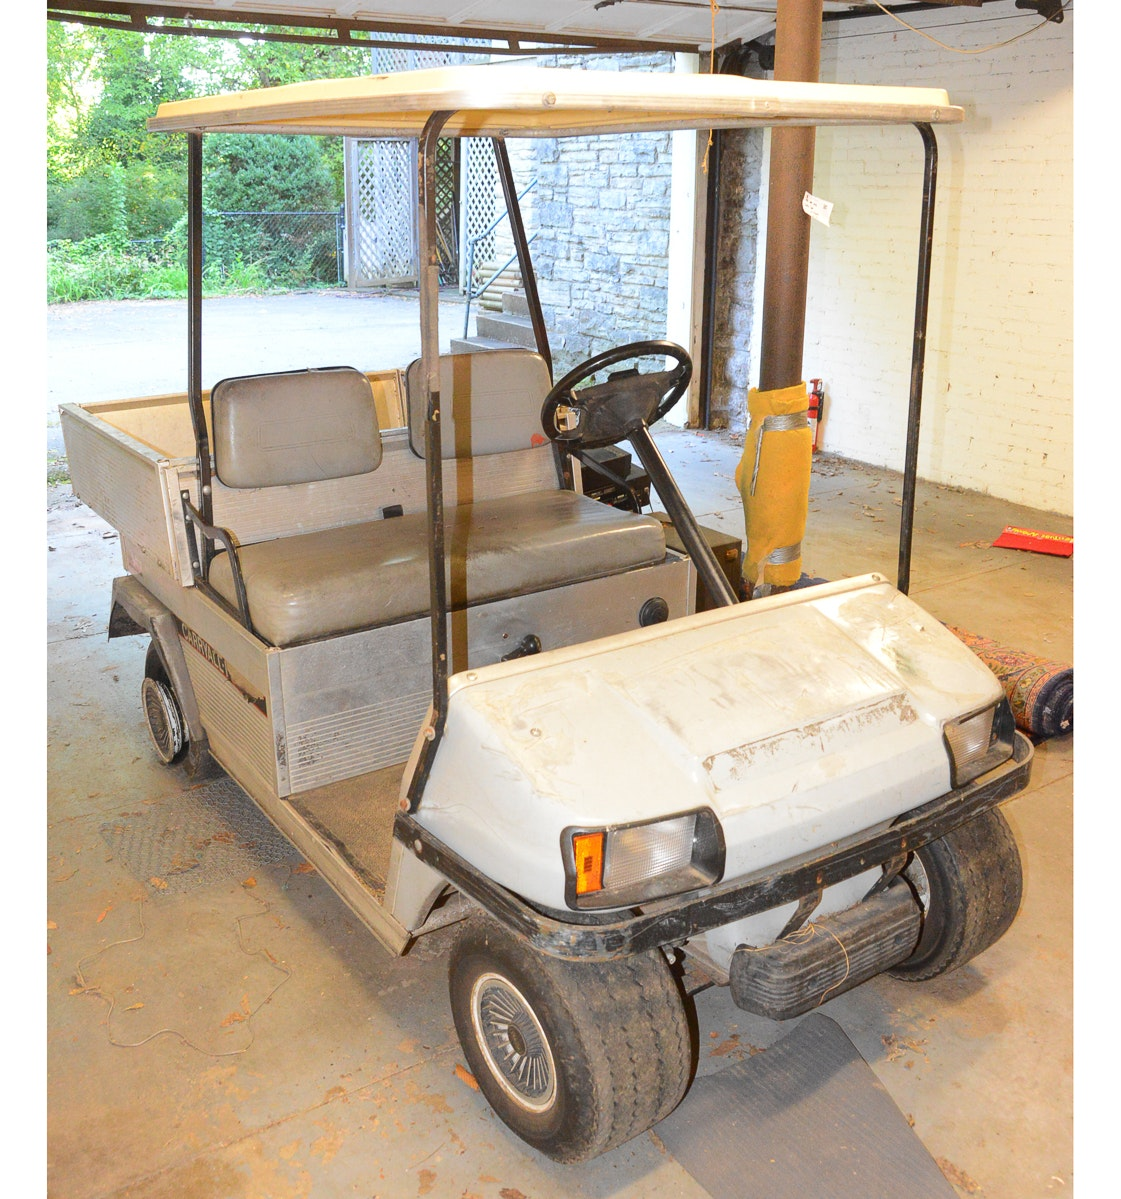 Ingersoll rand carryall club car ebth for Auto motor club comparisons